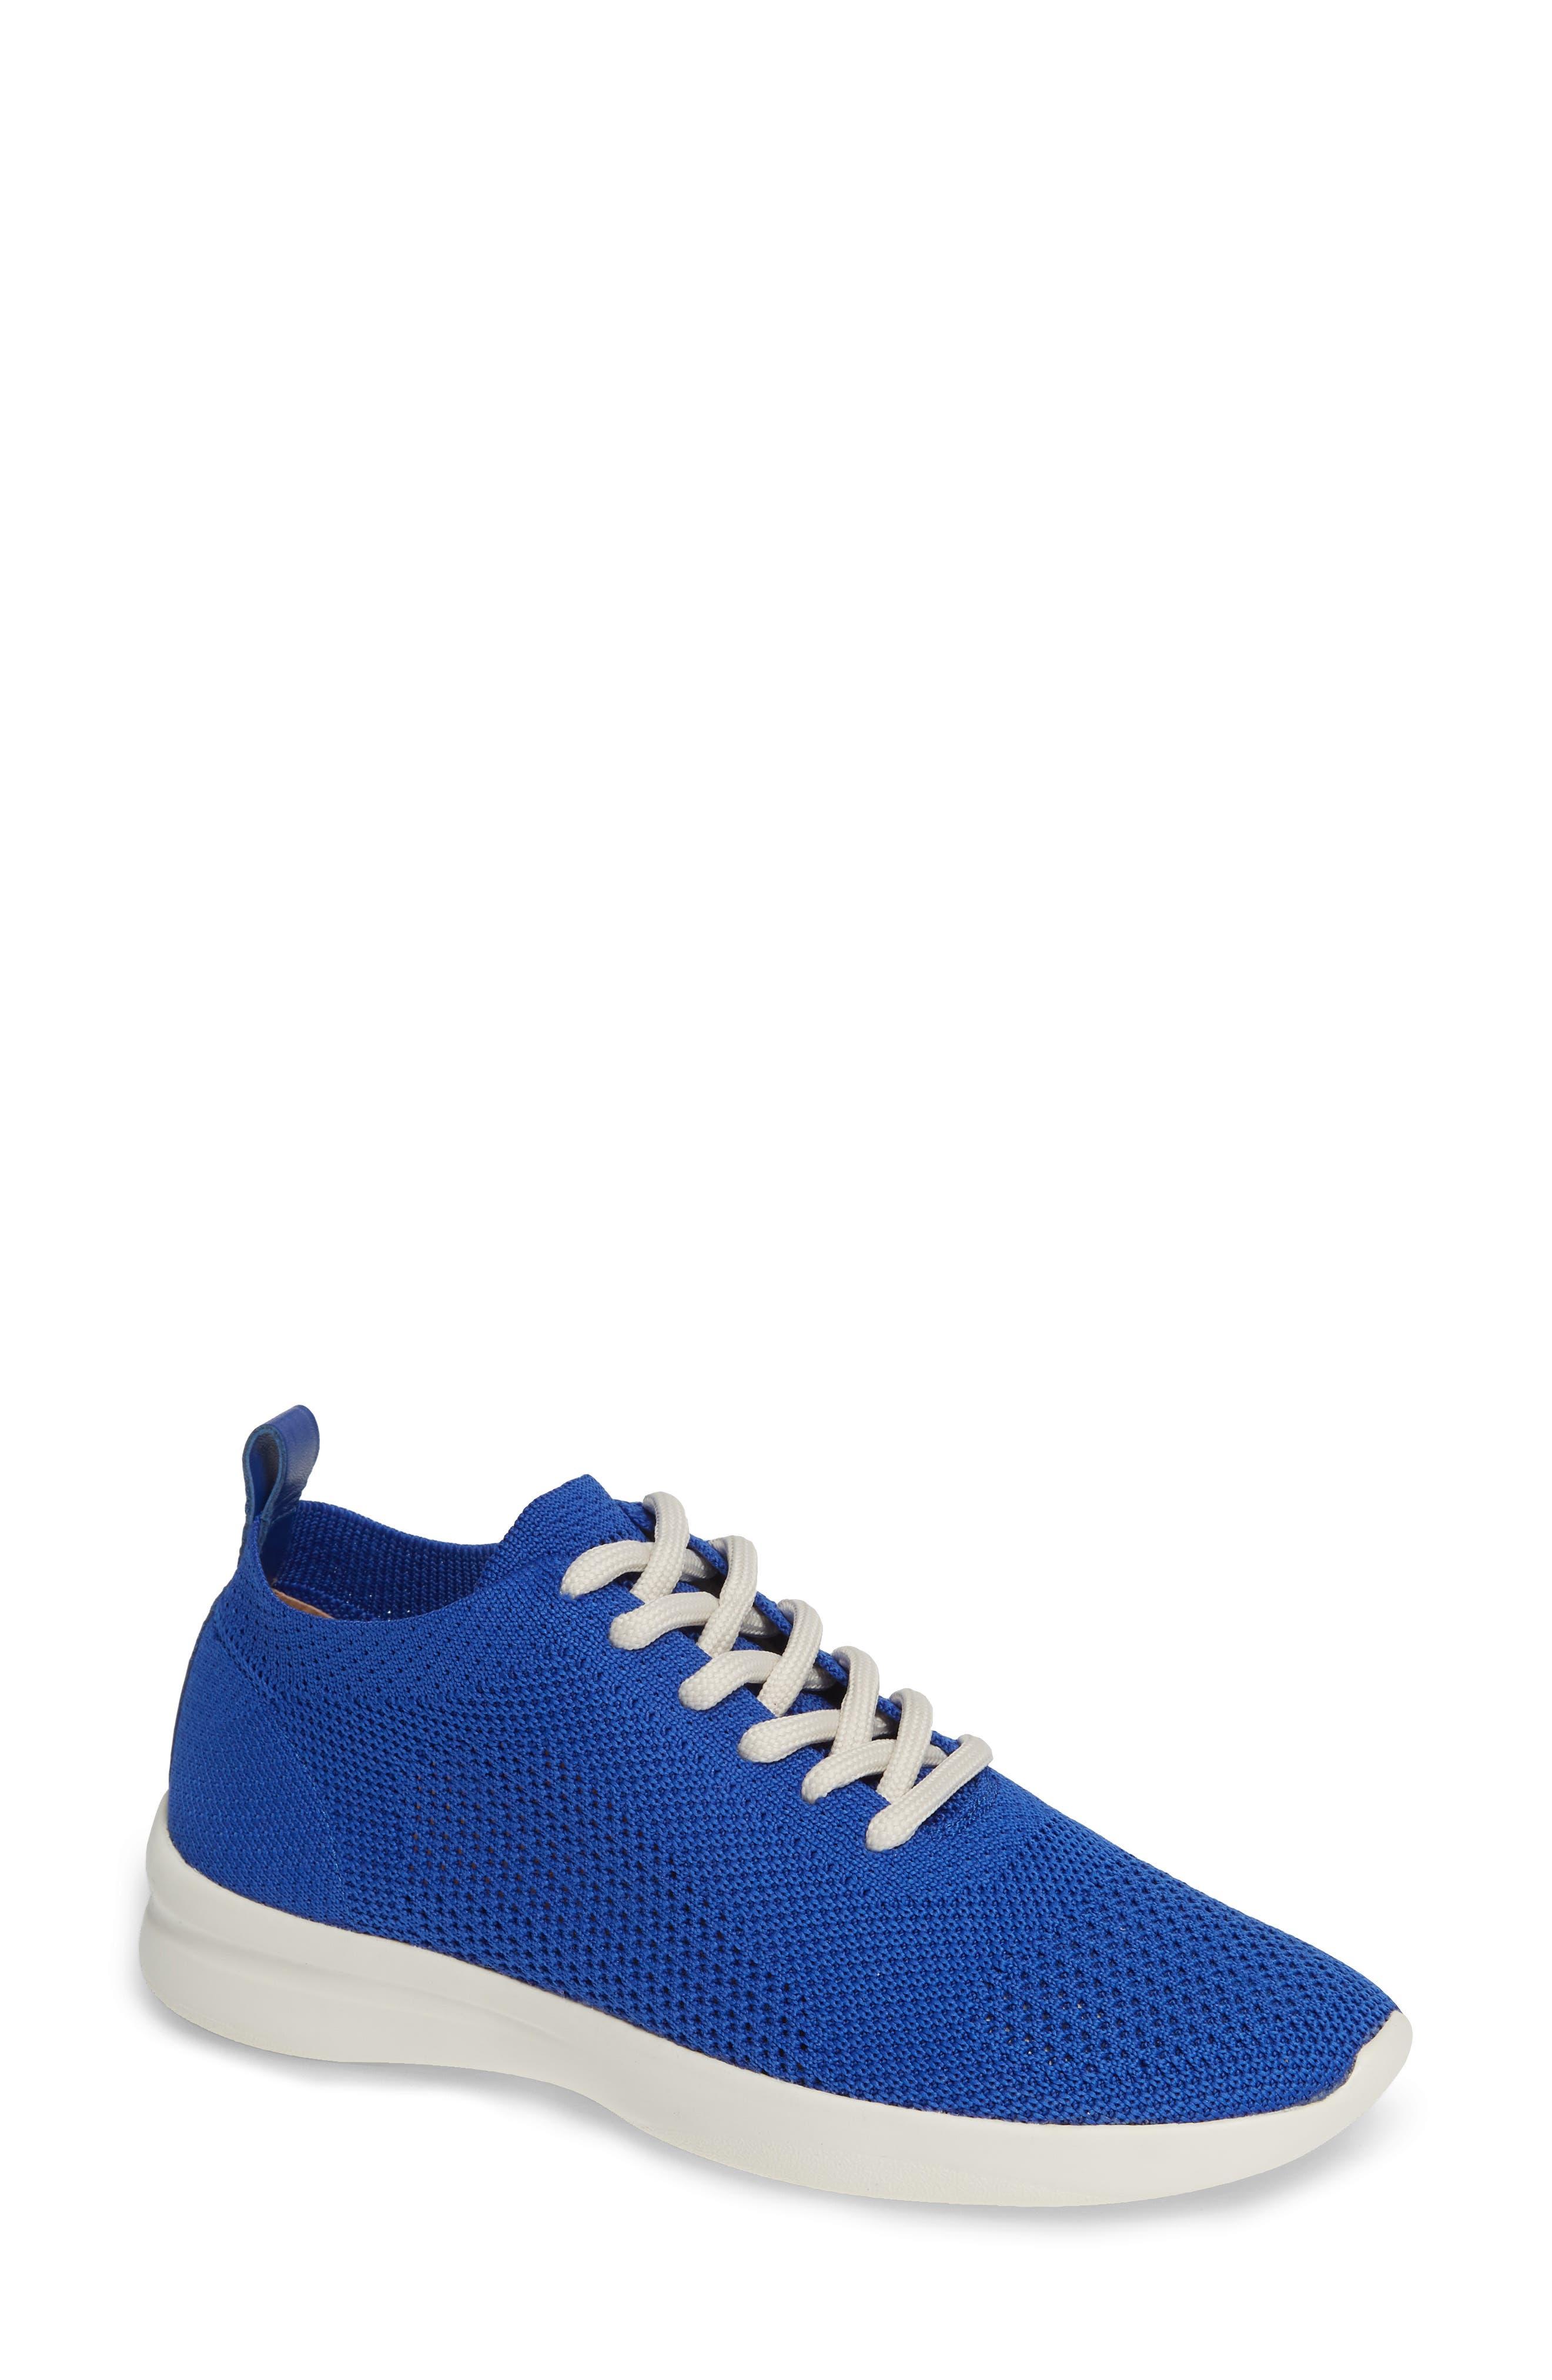 Randee Sneaker,                             Main thumbnail 1, color,                             Blue Fabric